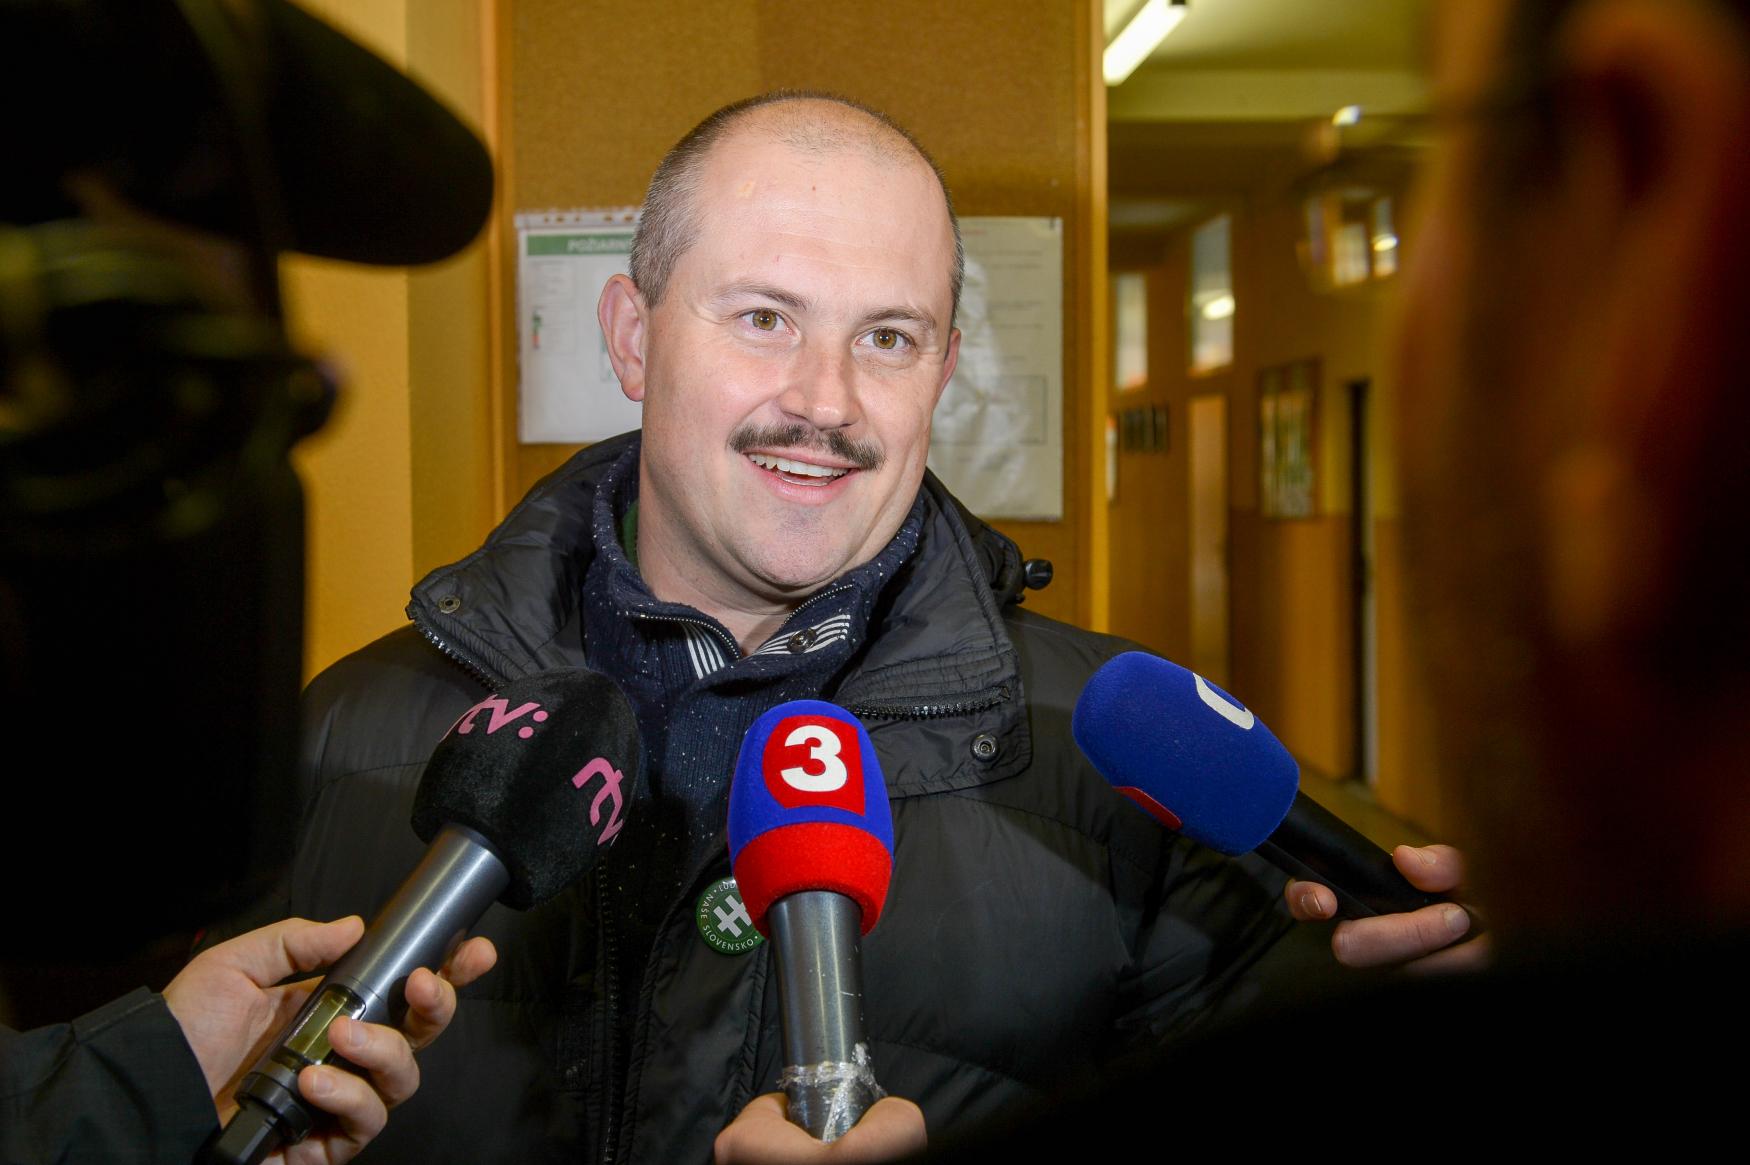 Předseda Ľudové strany Naše Slovensko Marian Kotleba neobhájil v krajských volbách post župana